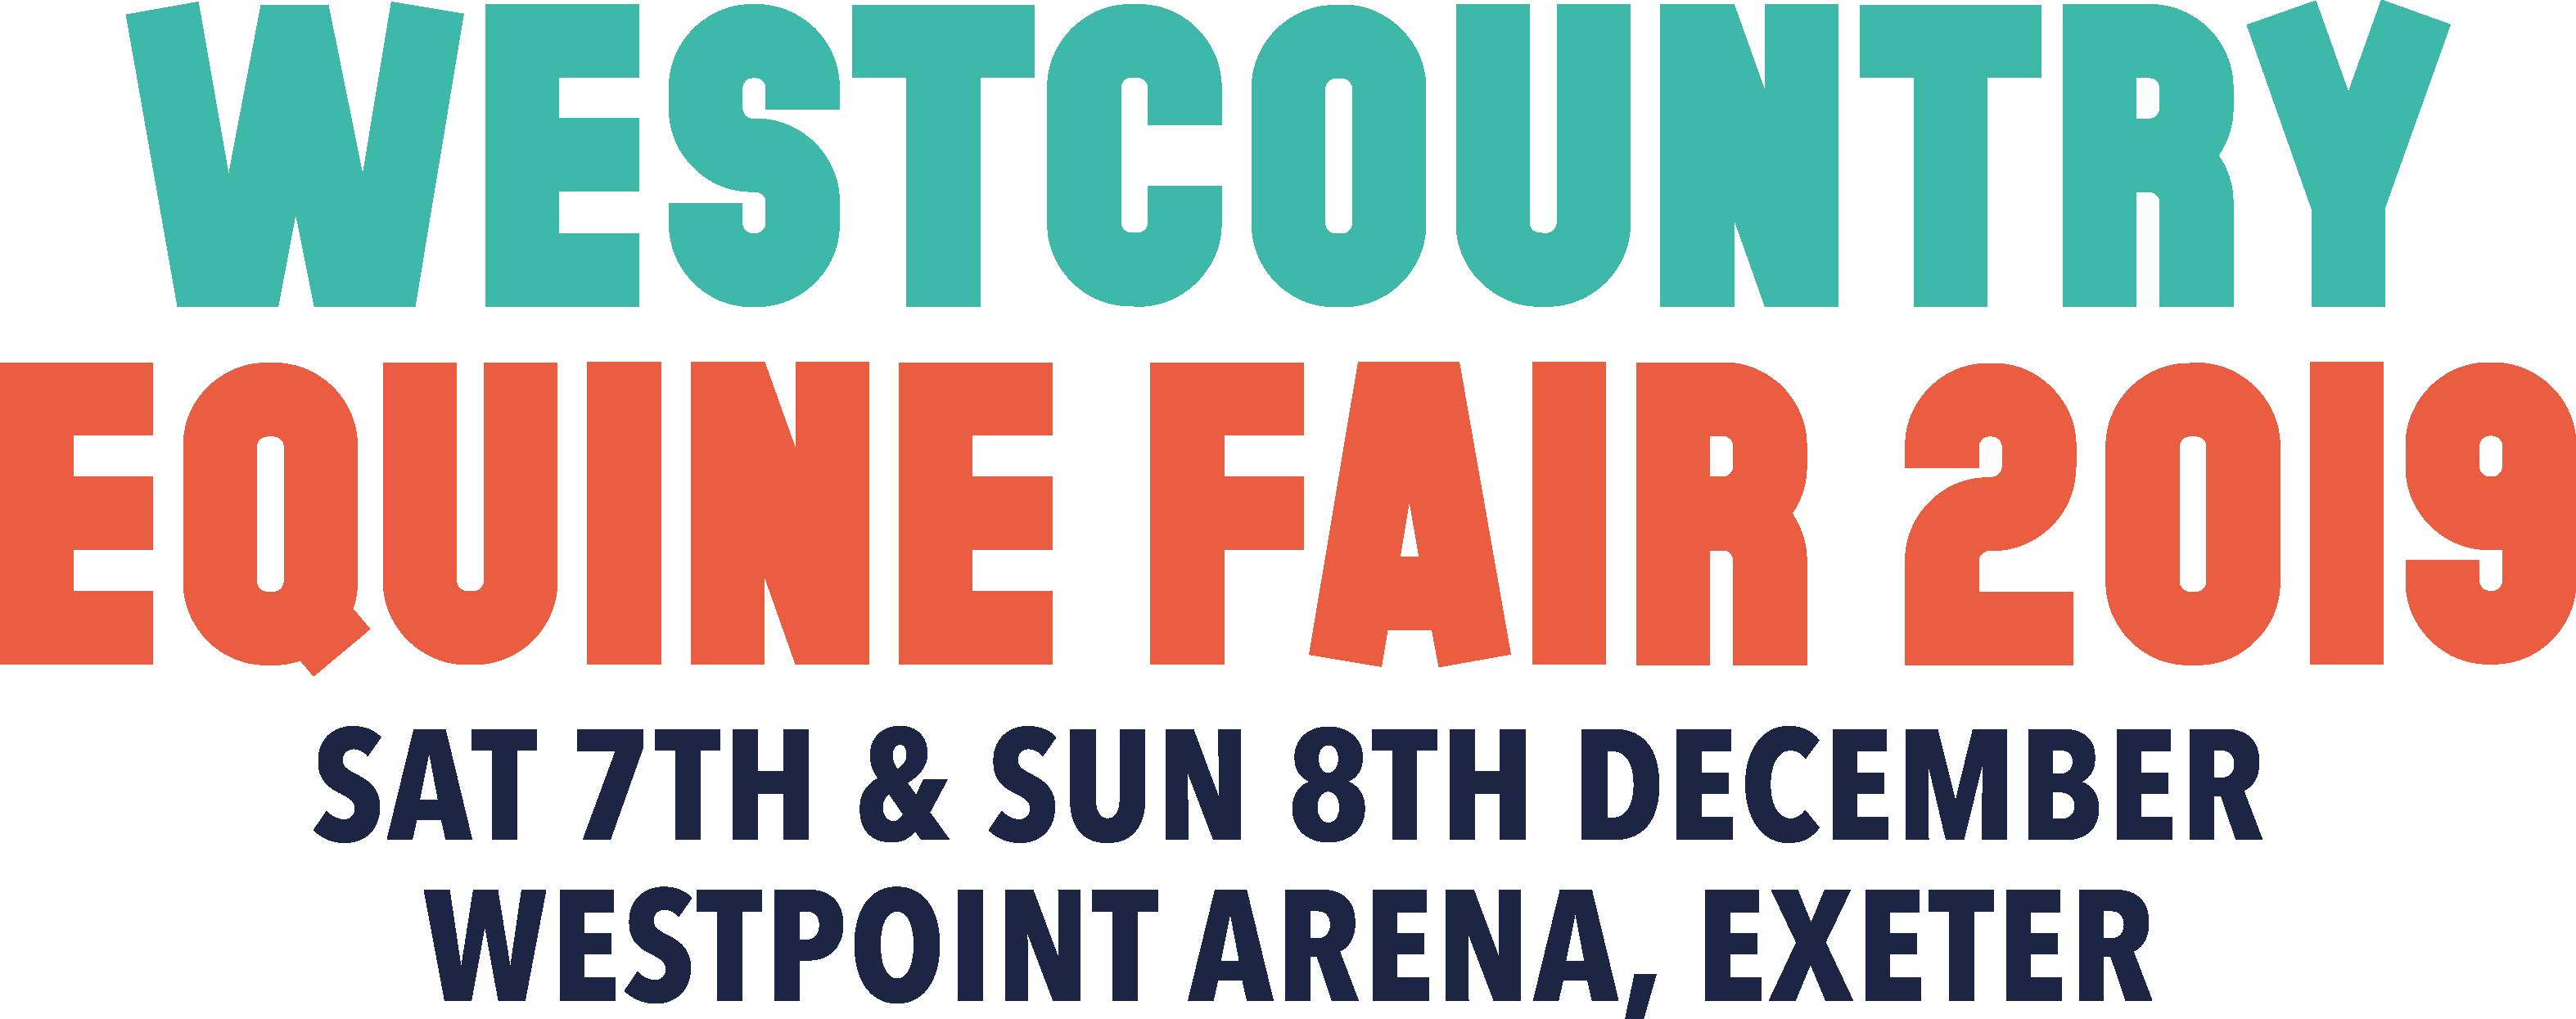 Westcountry Equine Fair